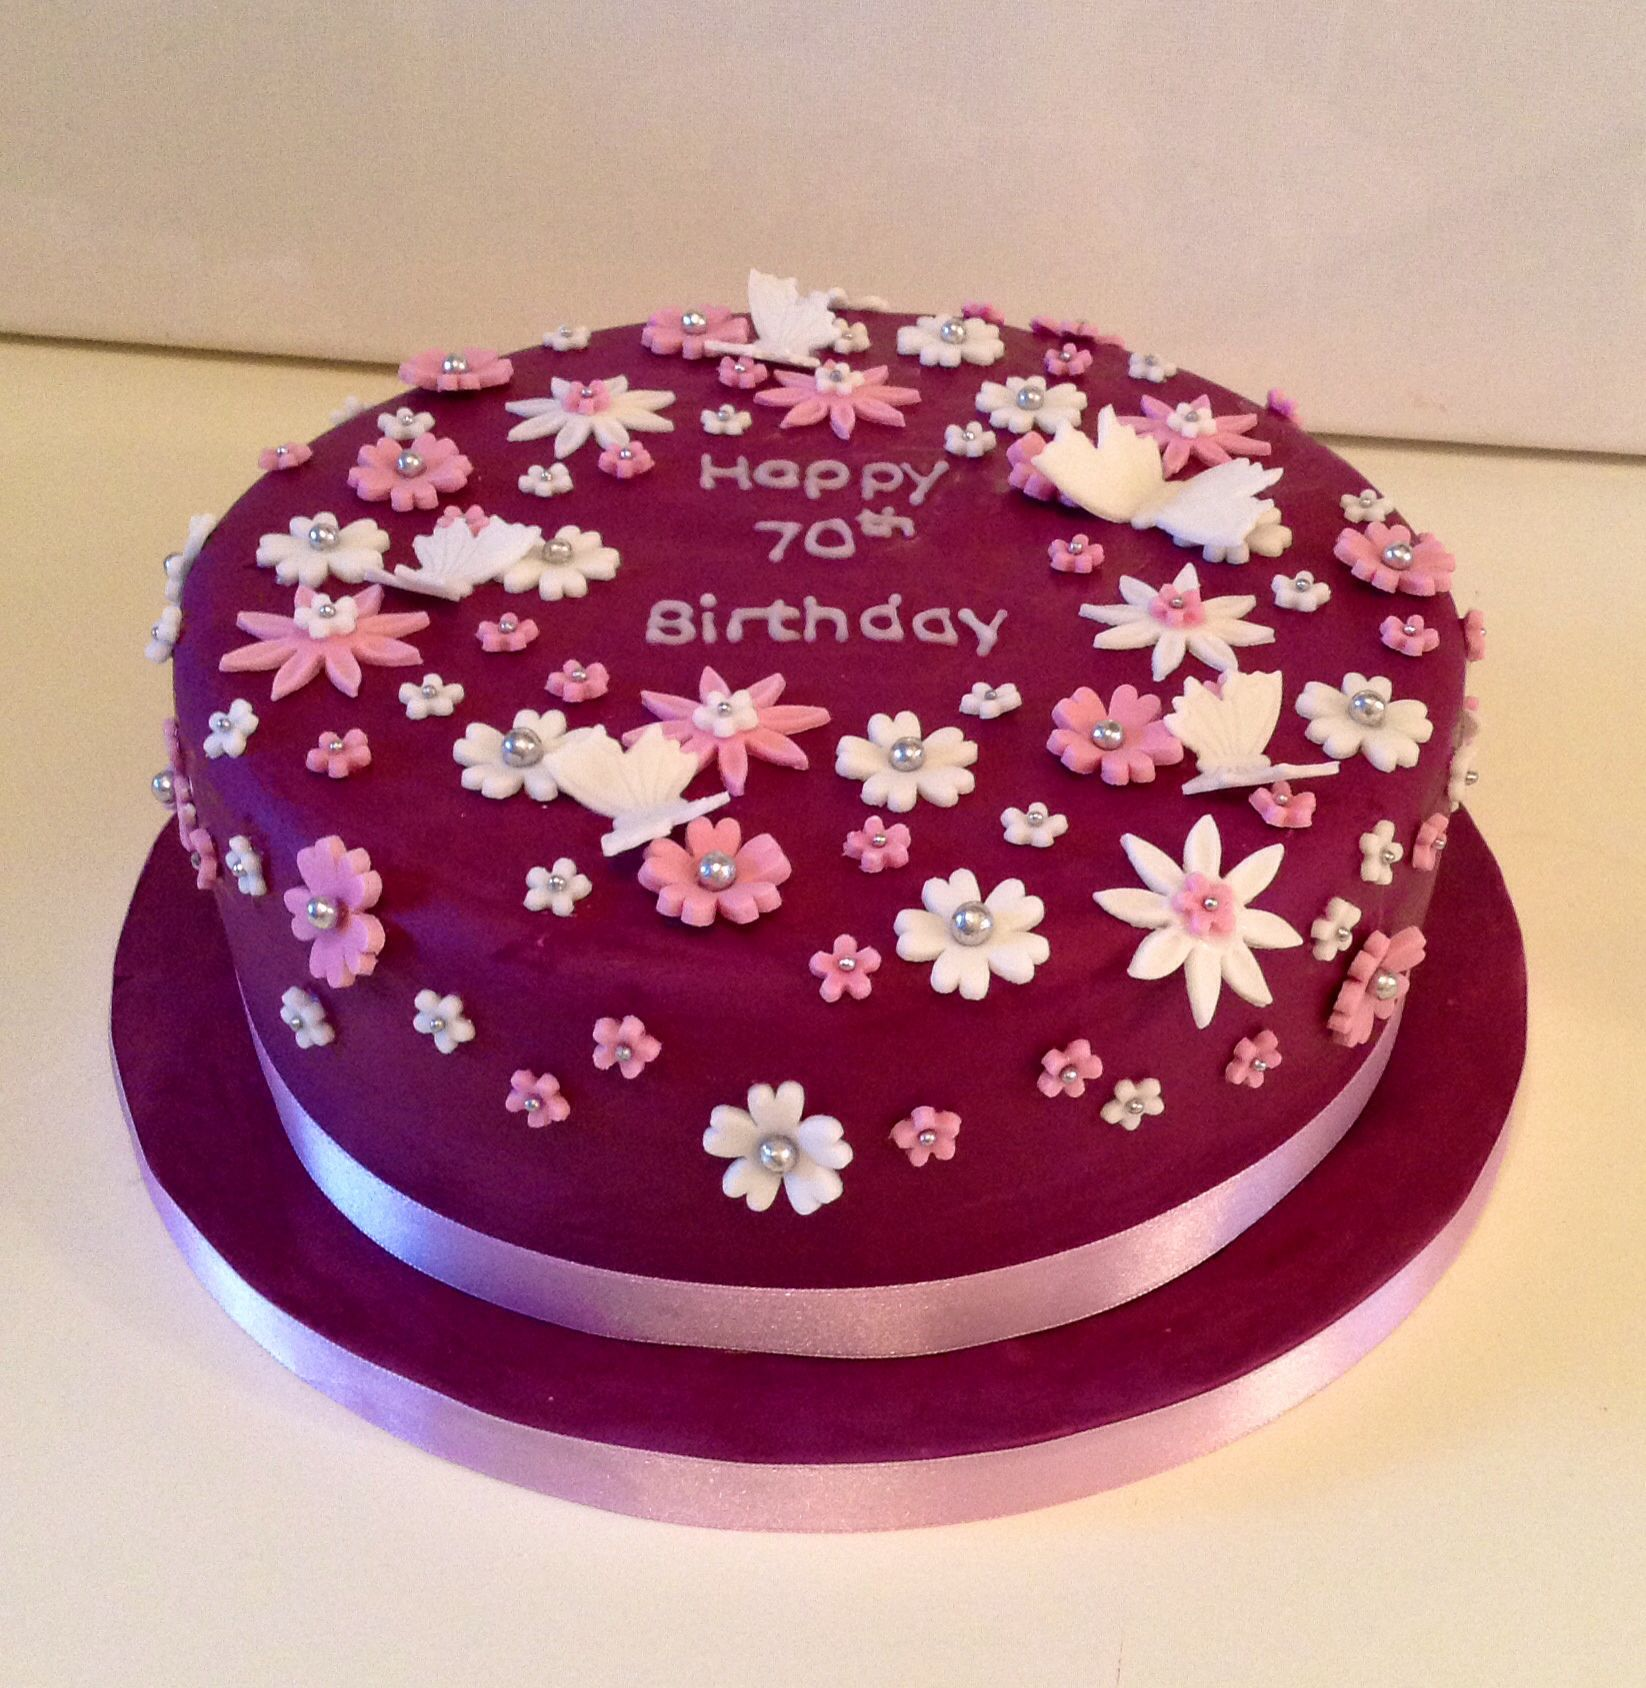 70th birthday cake Cakes Pinterest